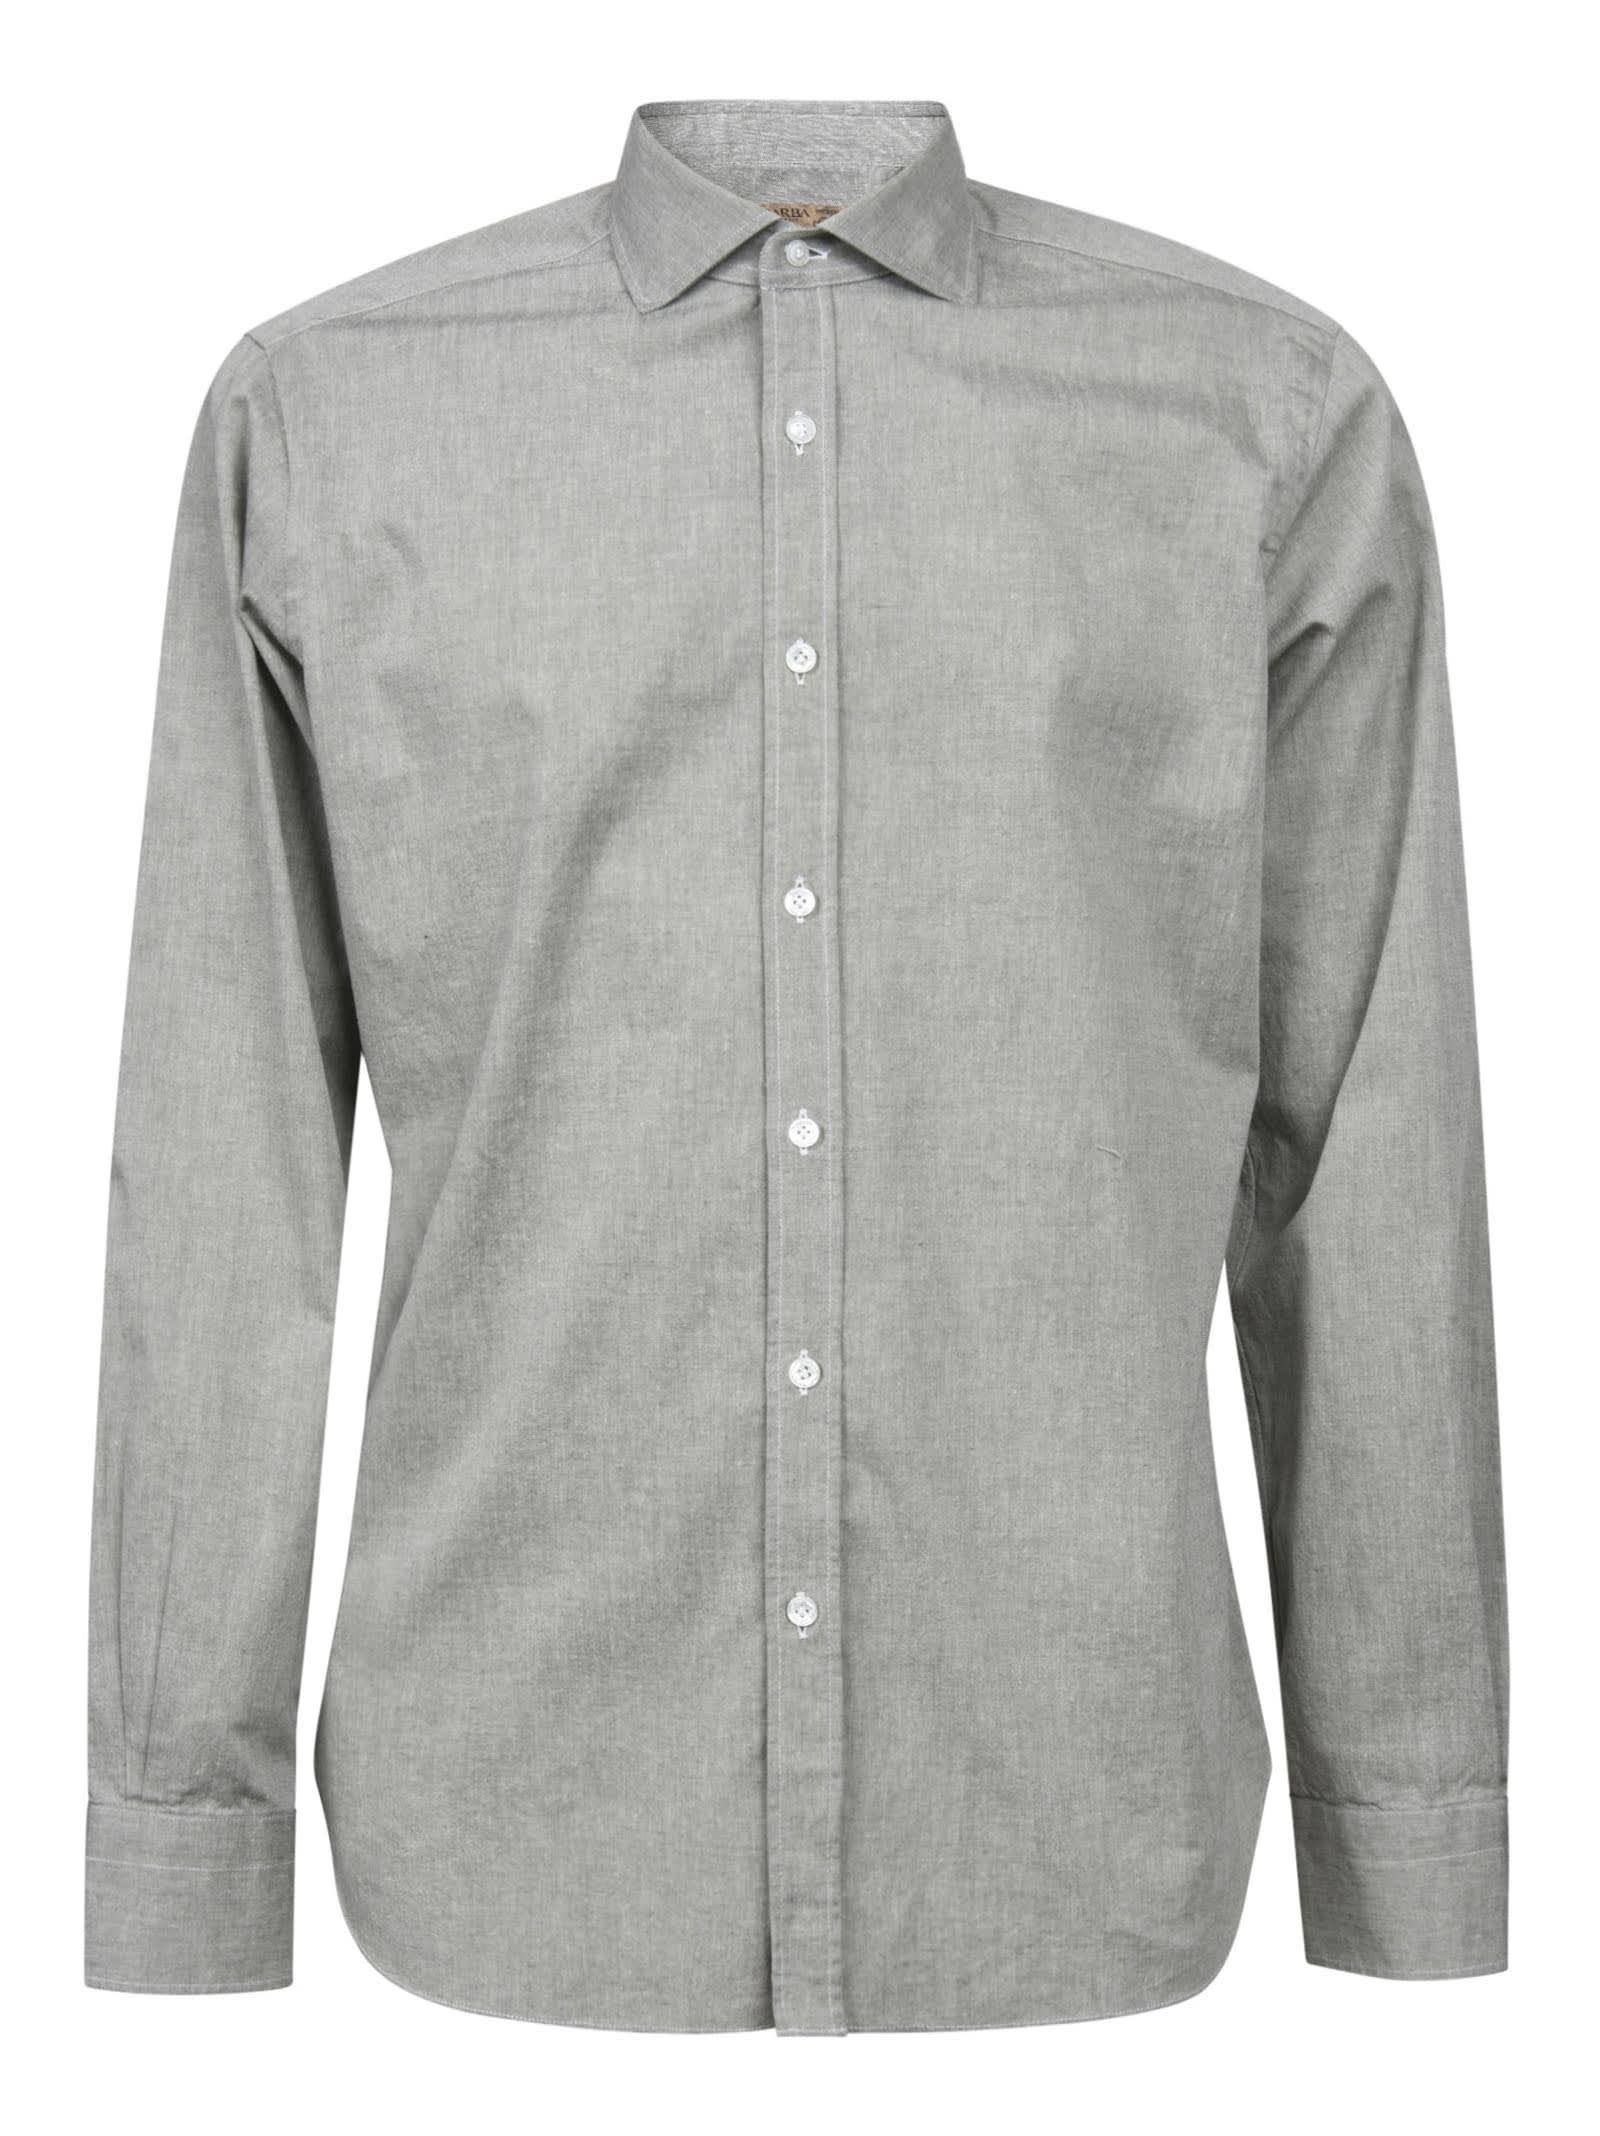 Dandylife Denim Shirt